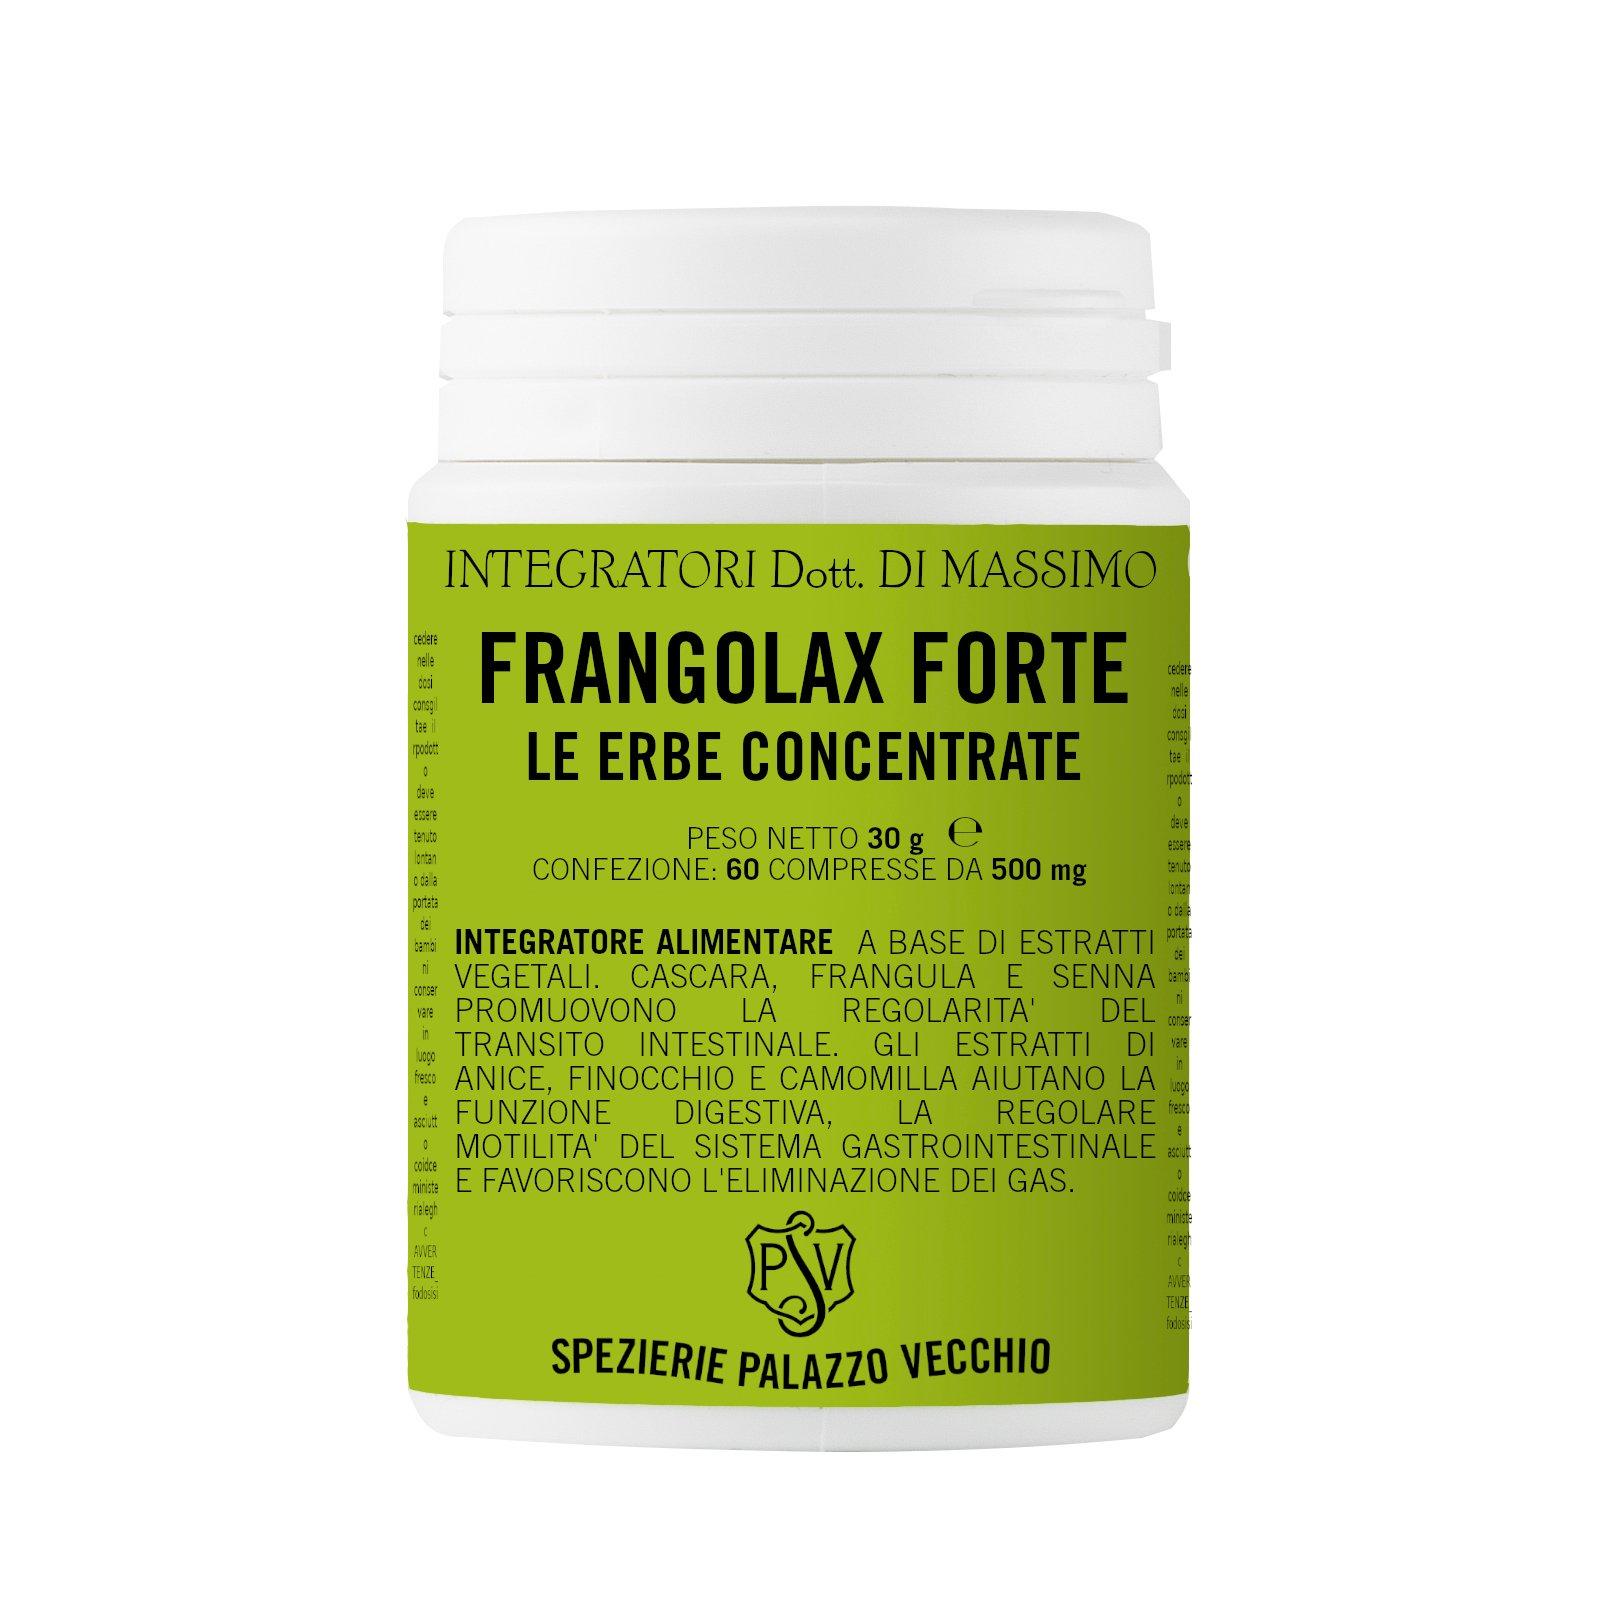 FRANGOLAX FORTE Le erbe concentrate-0